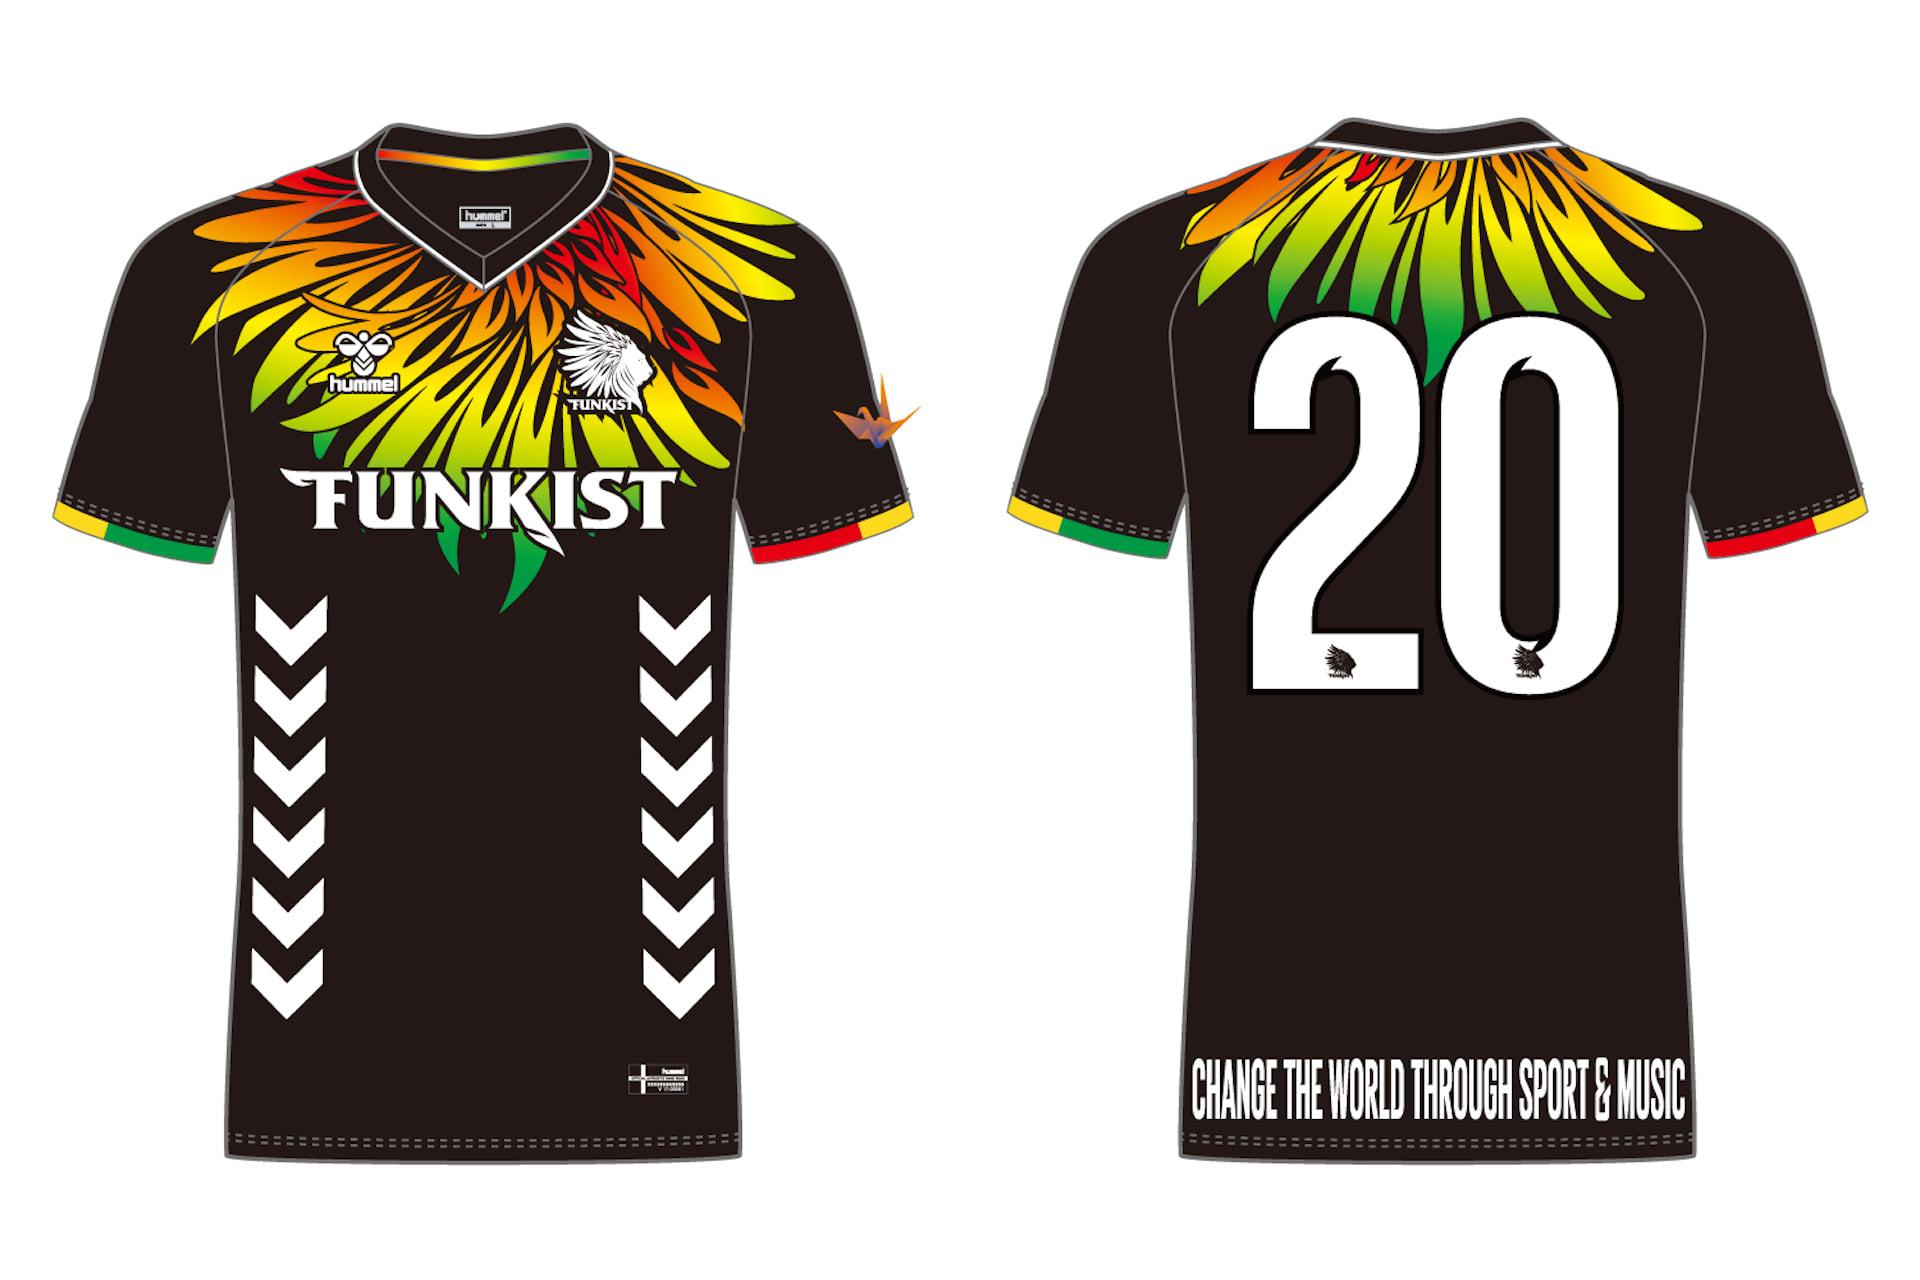 FUNKISTの20周年記念ユニフォームをヒュンメルがデザイン|売り上げの一部が南アフリカの支援に lifefashion190703funkist-hummel_6-1920x1280